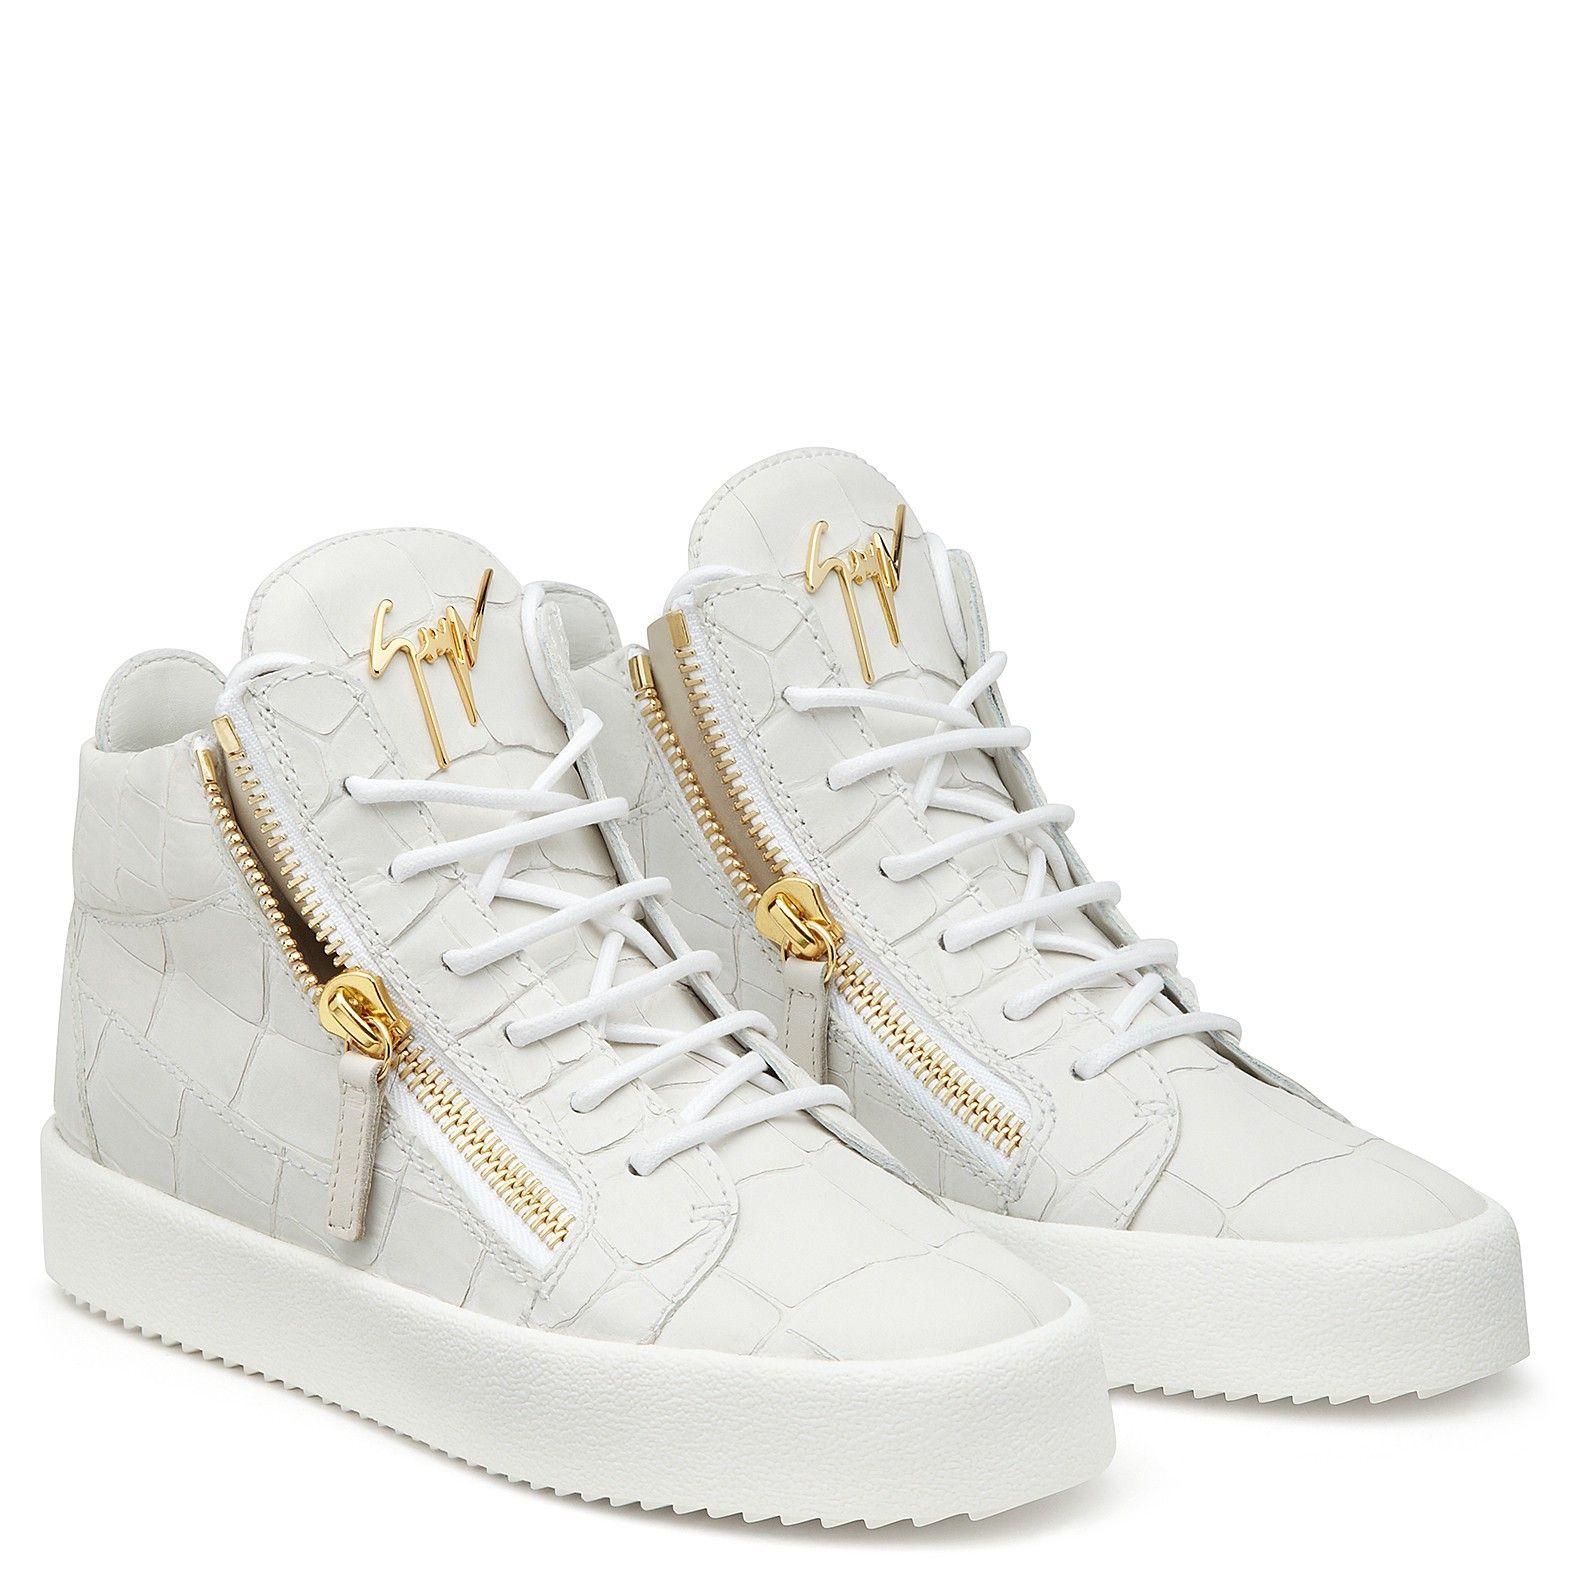 3655c05eccad1 Giuseppe Zanotti Kriss - White Us10,5 (It40,5) | Products | Sneakers ...